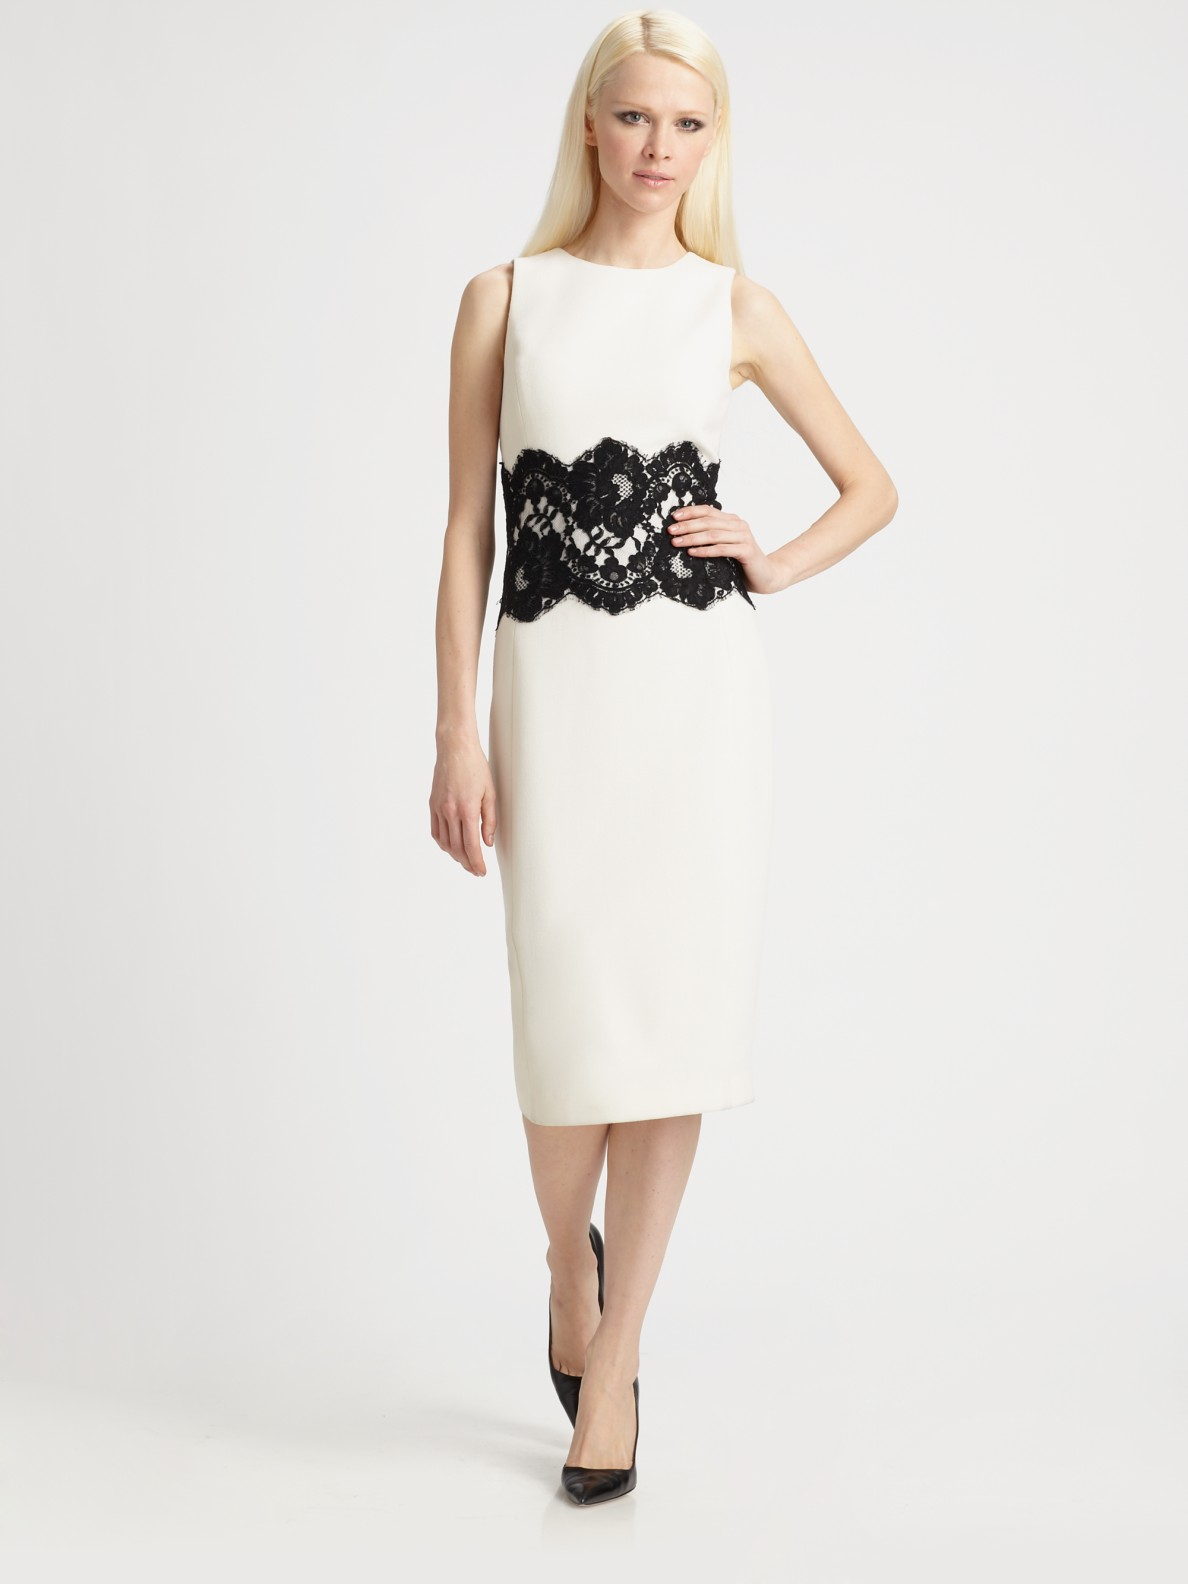 Lyst - Michael kors Wool Lace Waist Dress in White